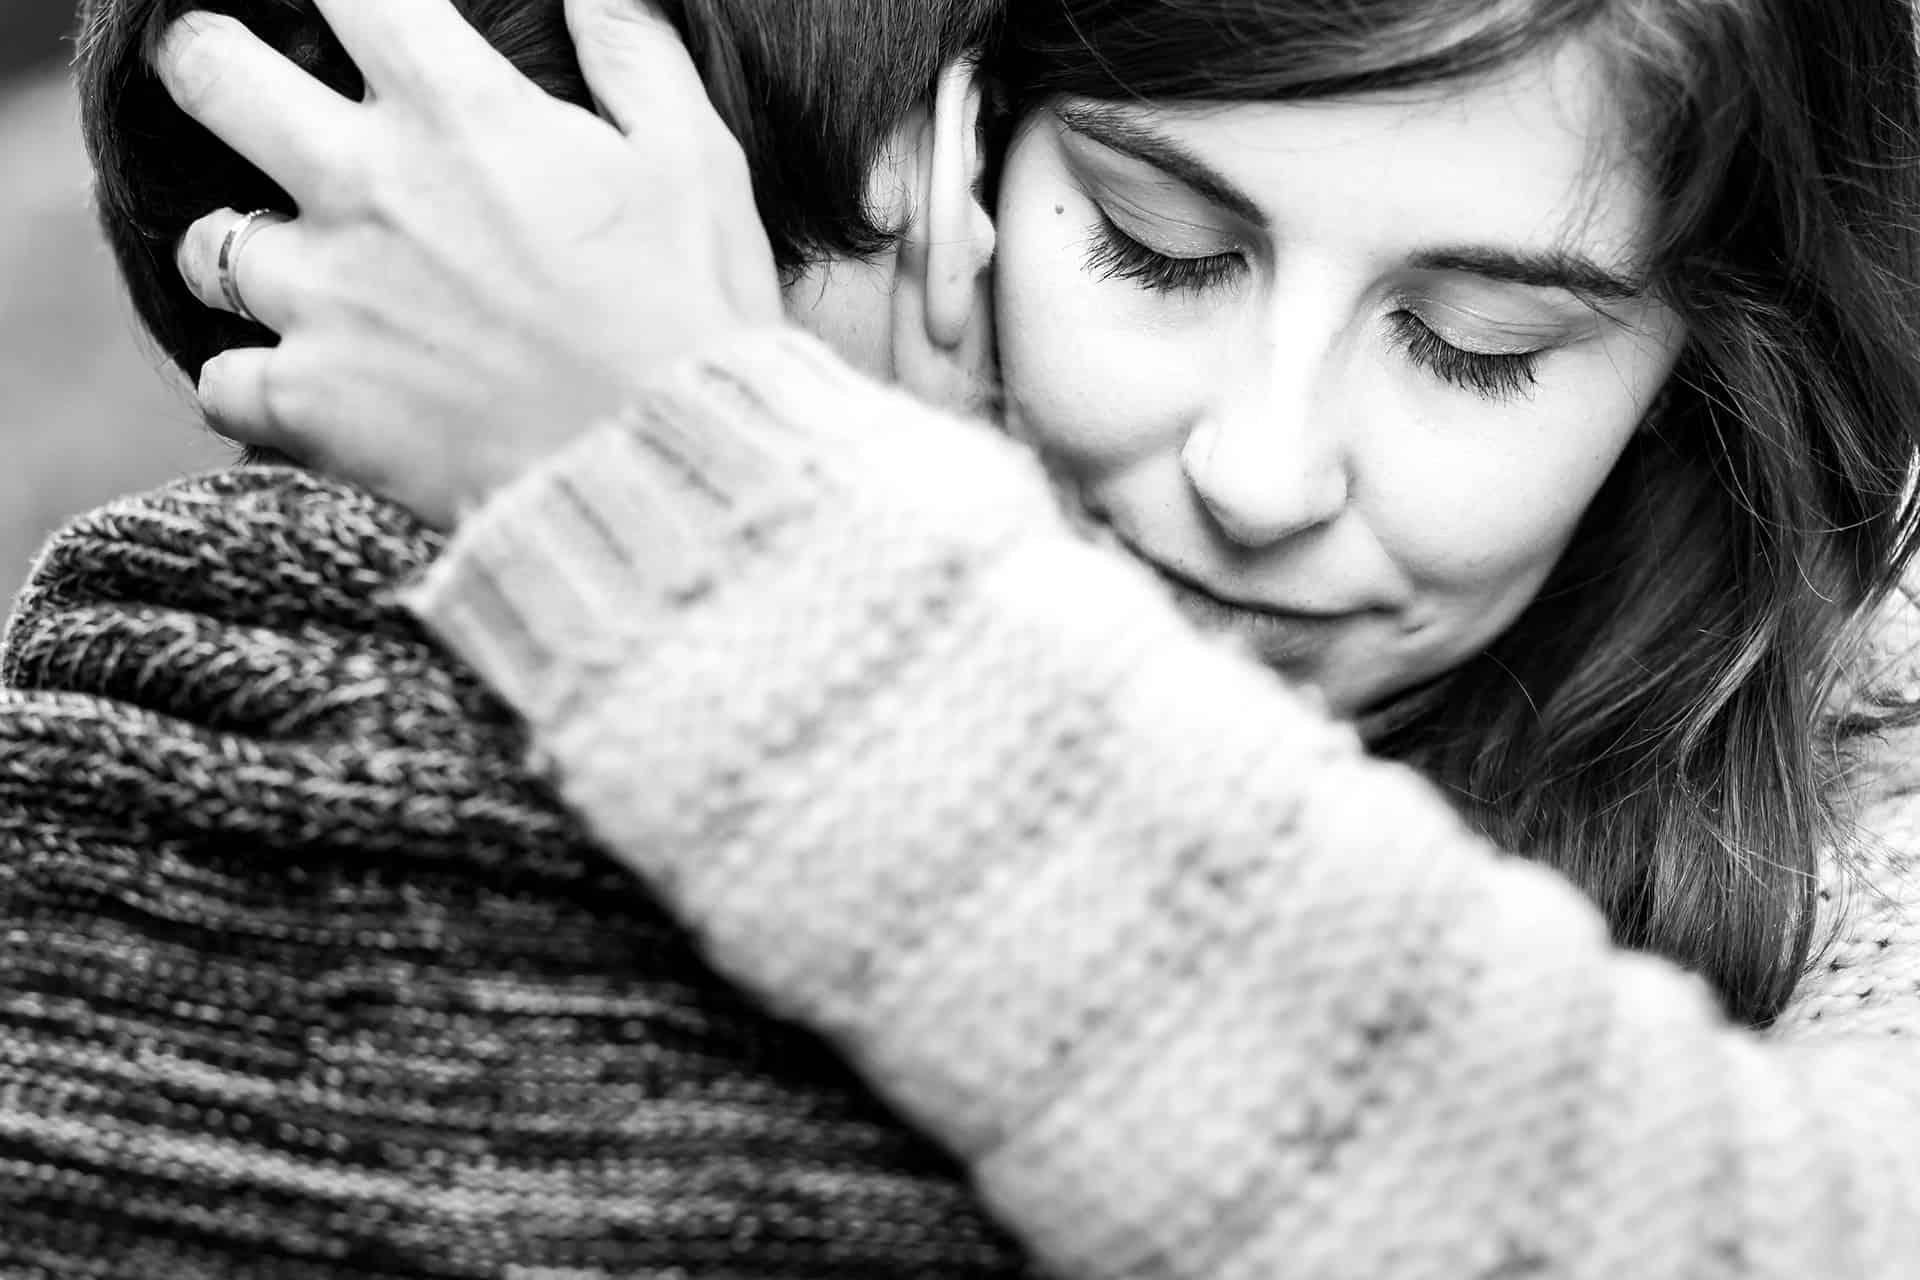 novia abrazando a su futuro marido